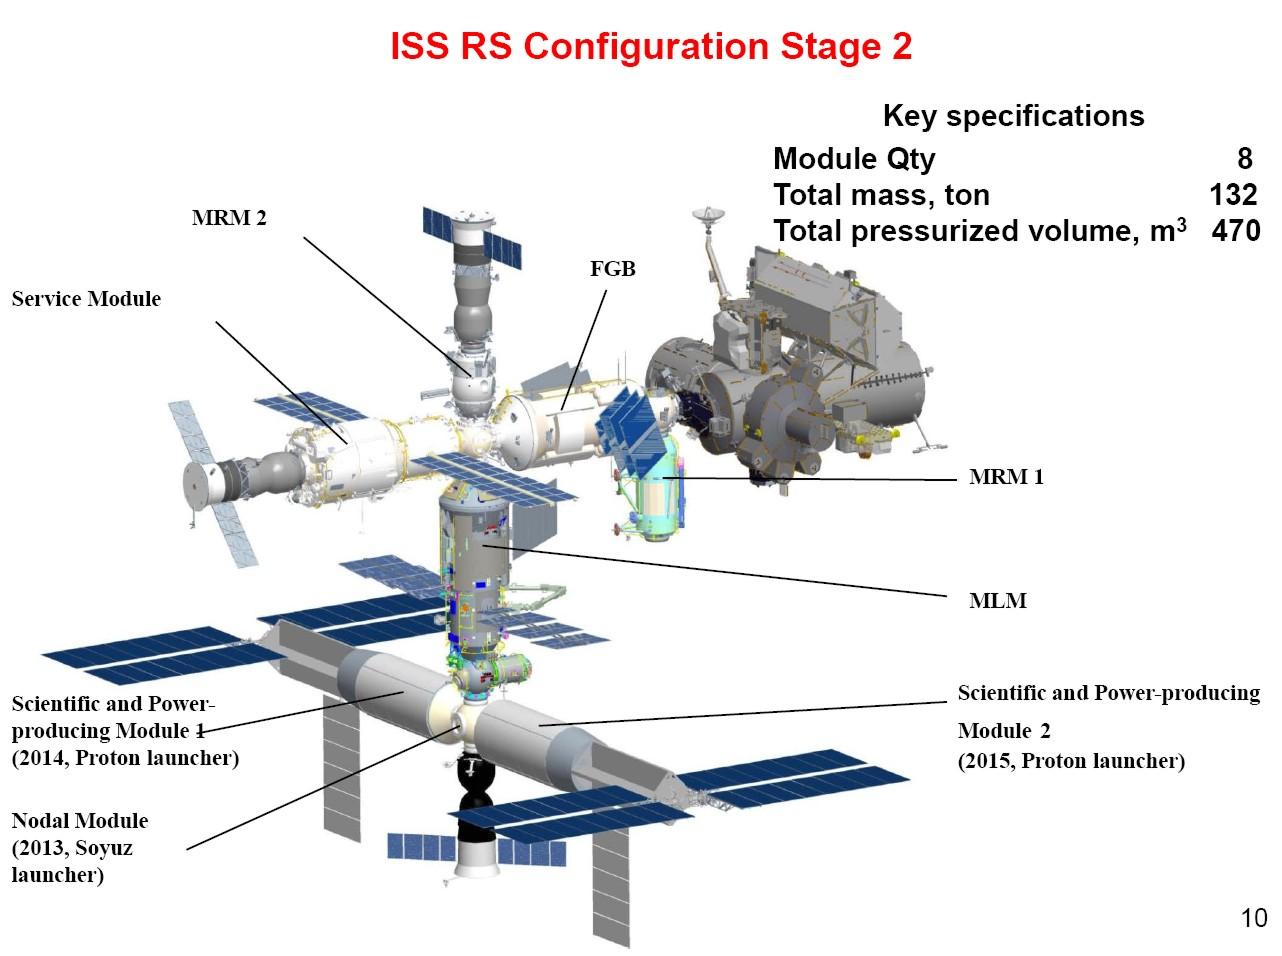 la Russie ajoutera 3 modules à son segment avant 2011 - Page 4 Module10